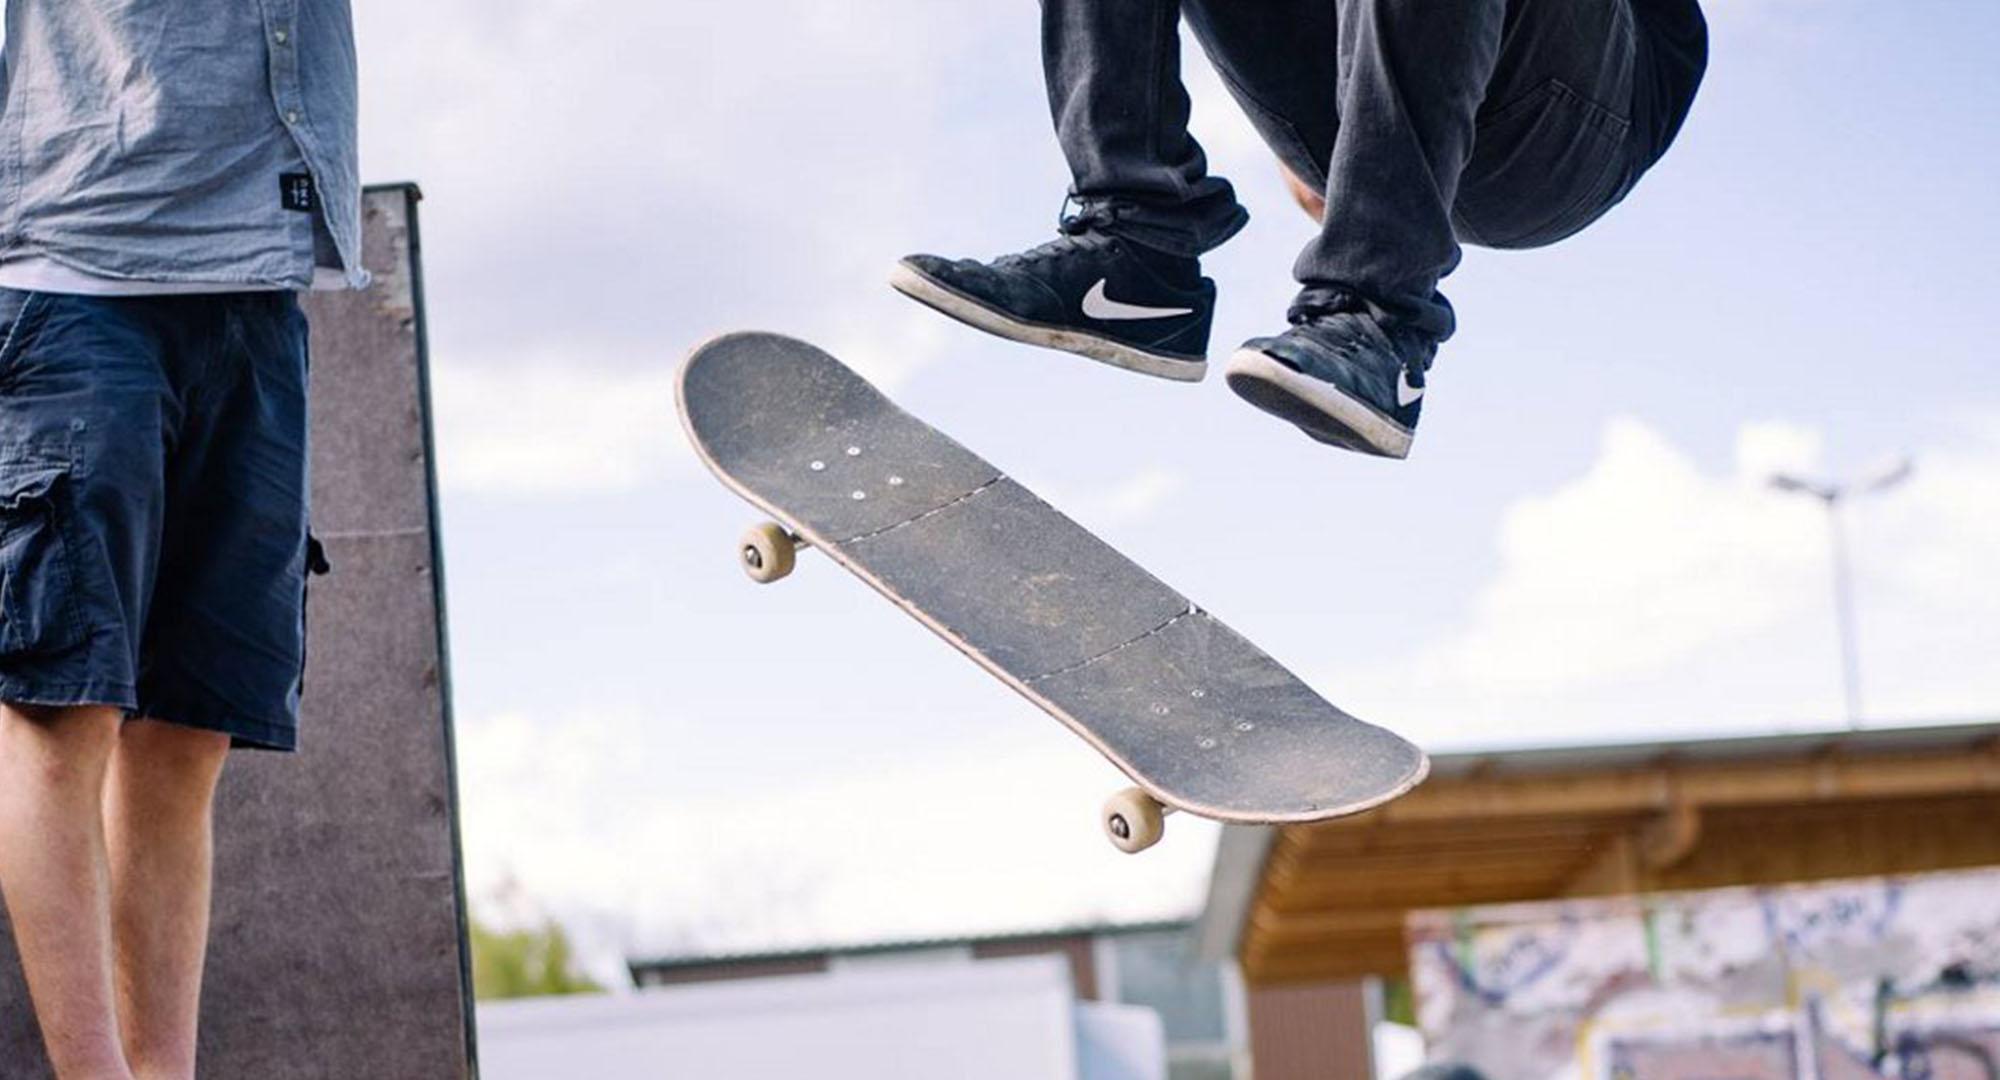 Rollsportverein Ebersberg Skatepark Aufnahme, Skater beim Sprung